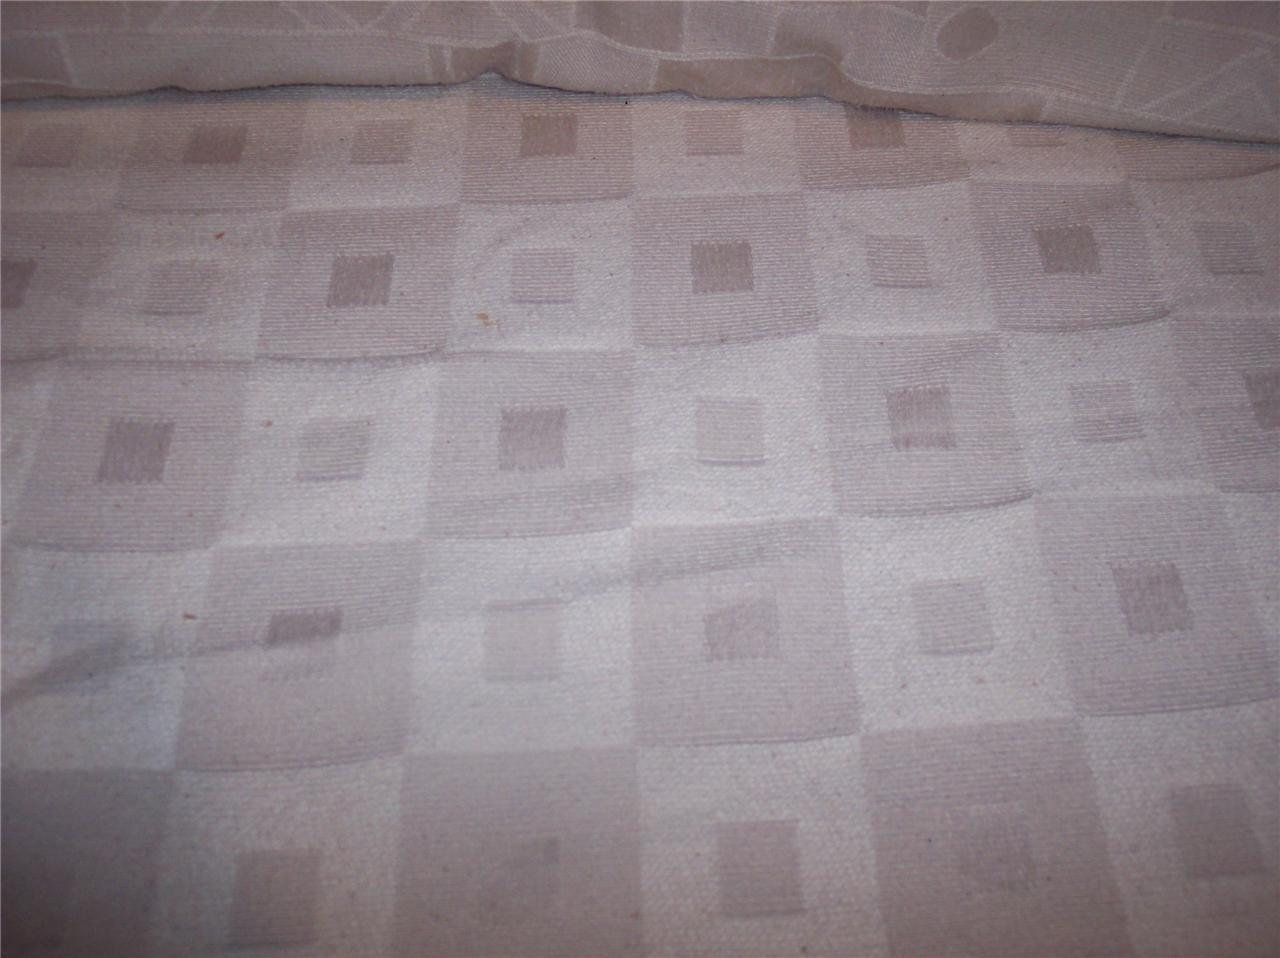 Cream Retro Square Print Jacquard Fabric/Upholstery Fabric Remnant